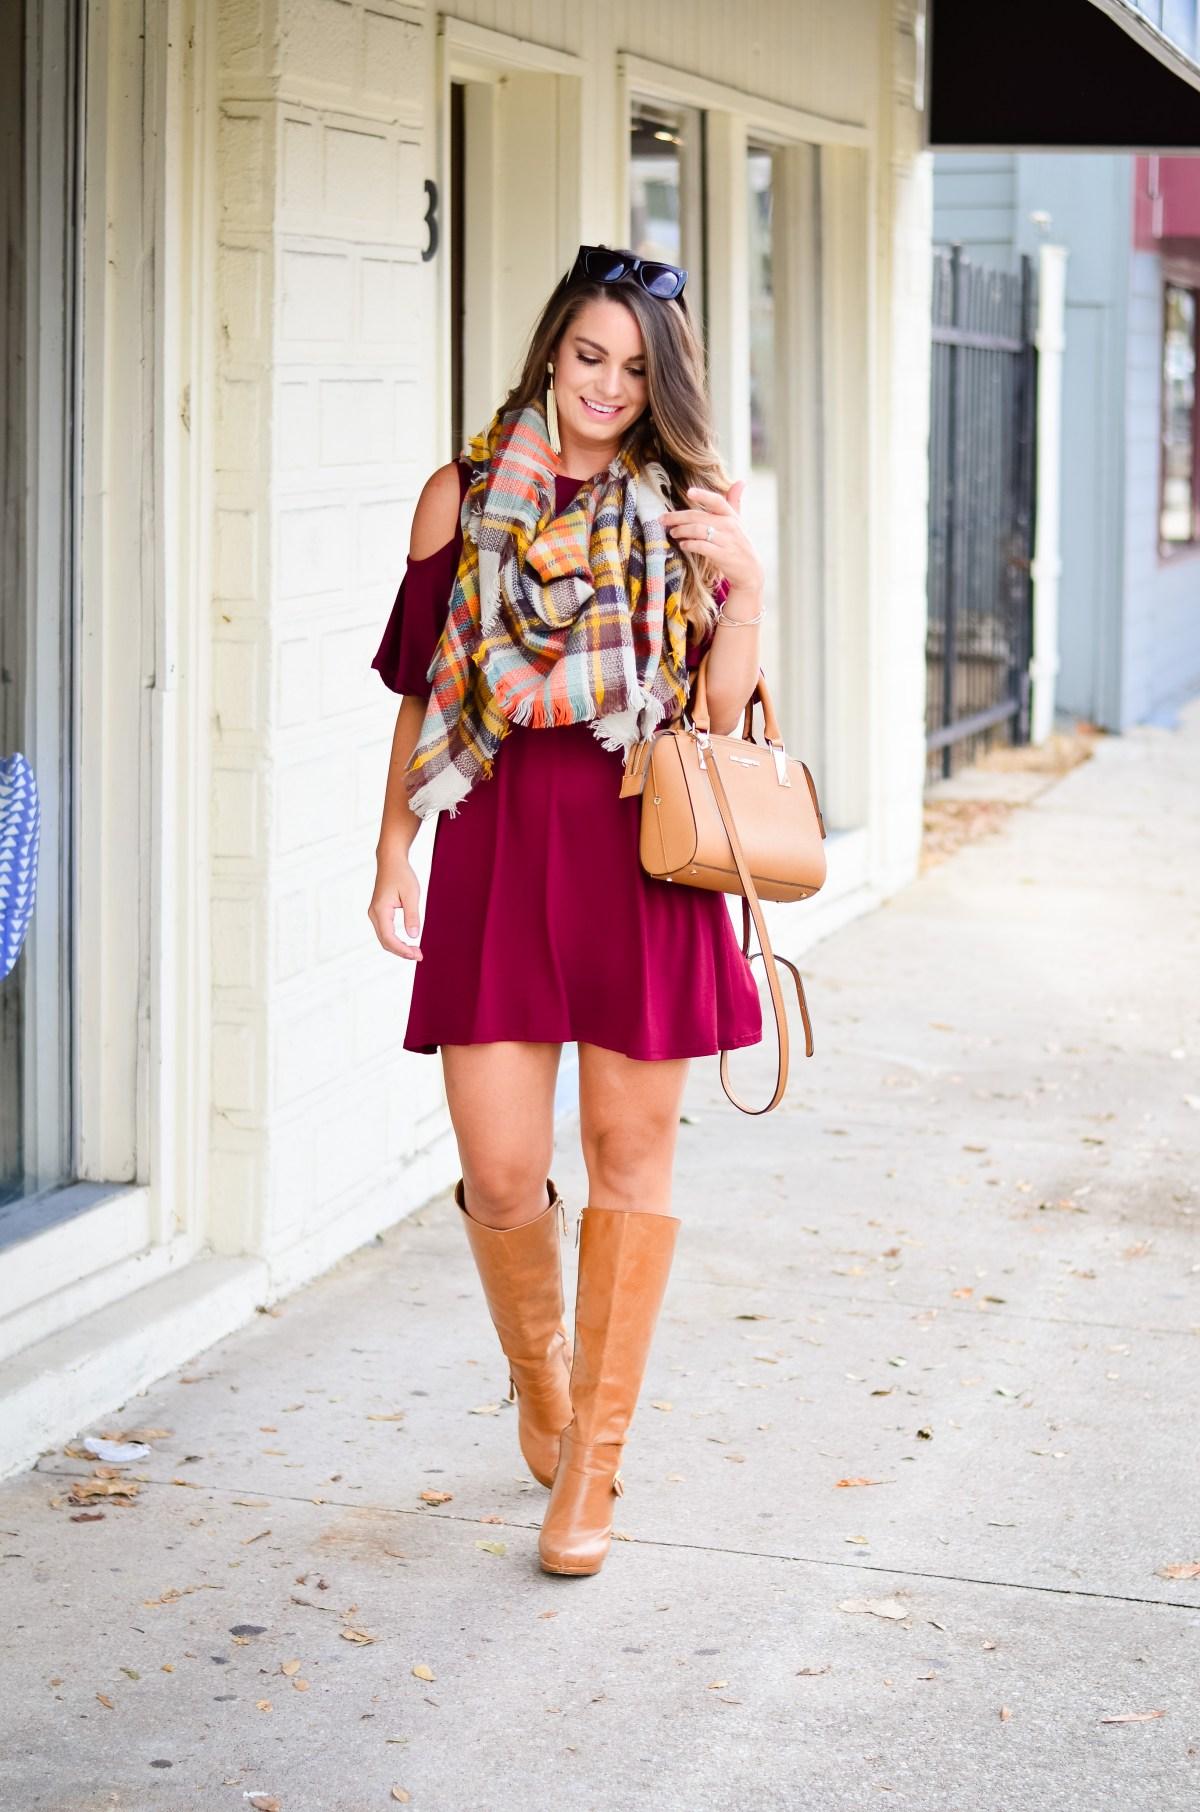 maroon-dress-blanket-scarf-goldfinch-4